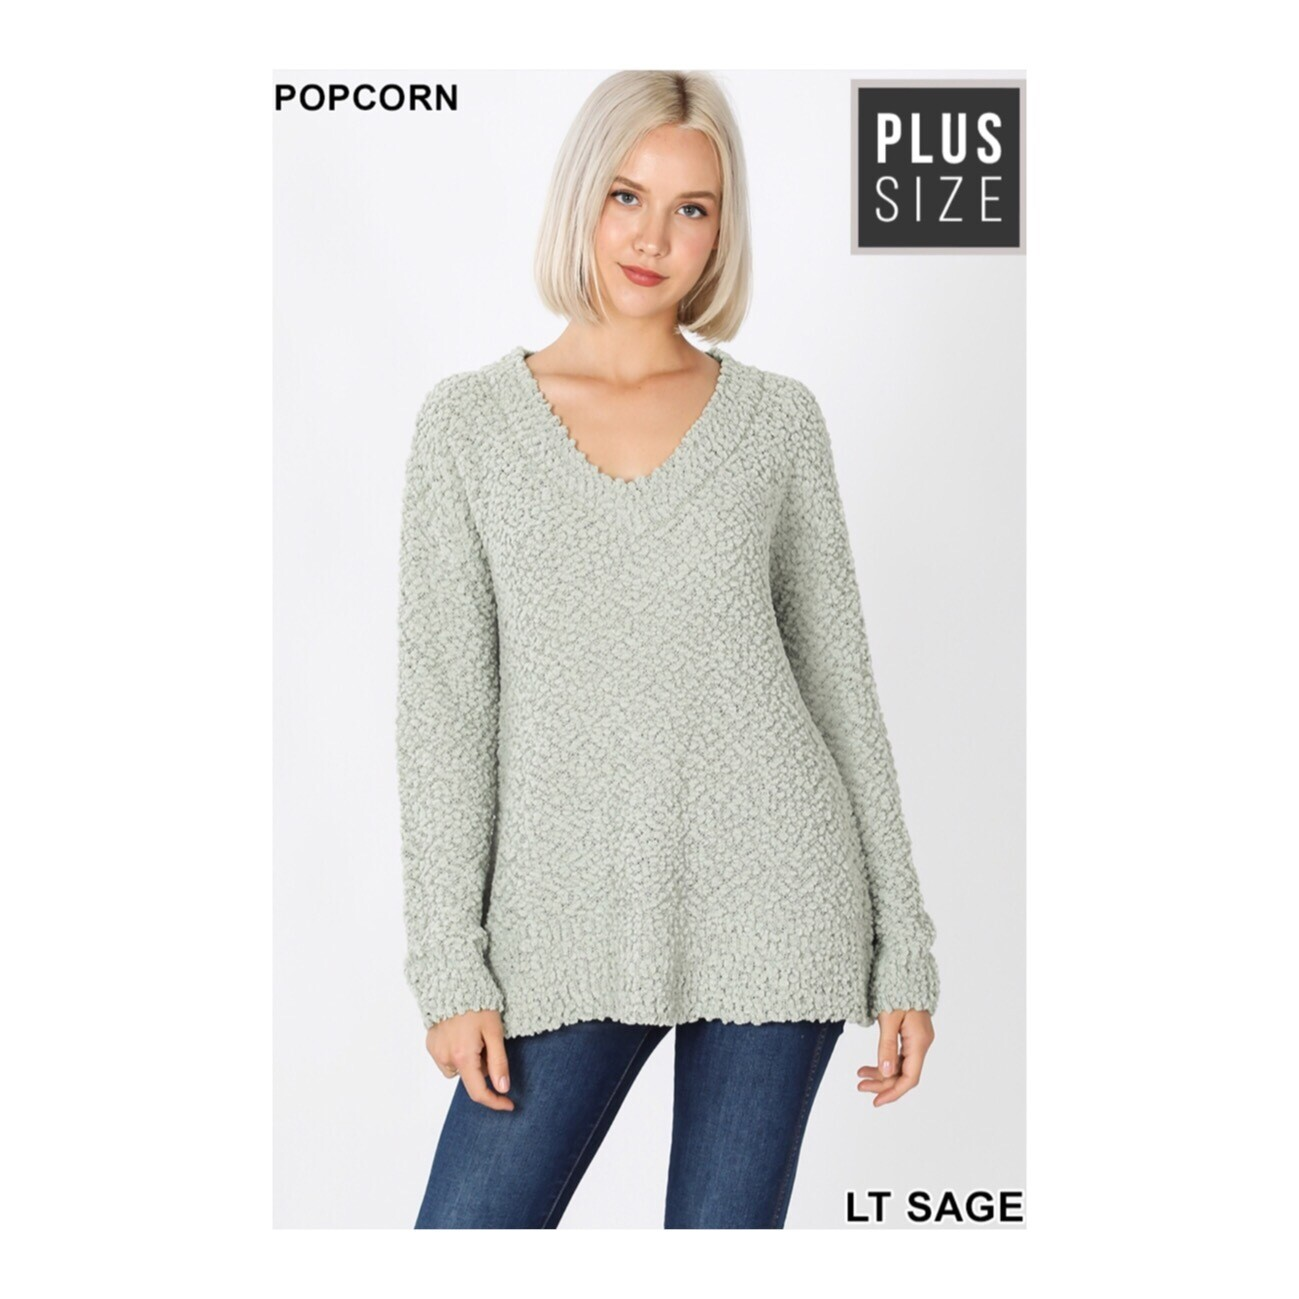 Popcorn Sage Sweater